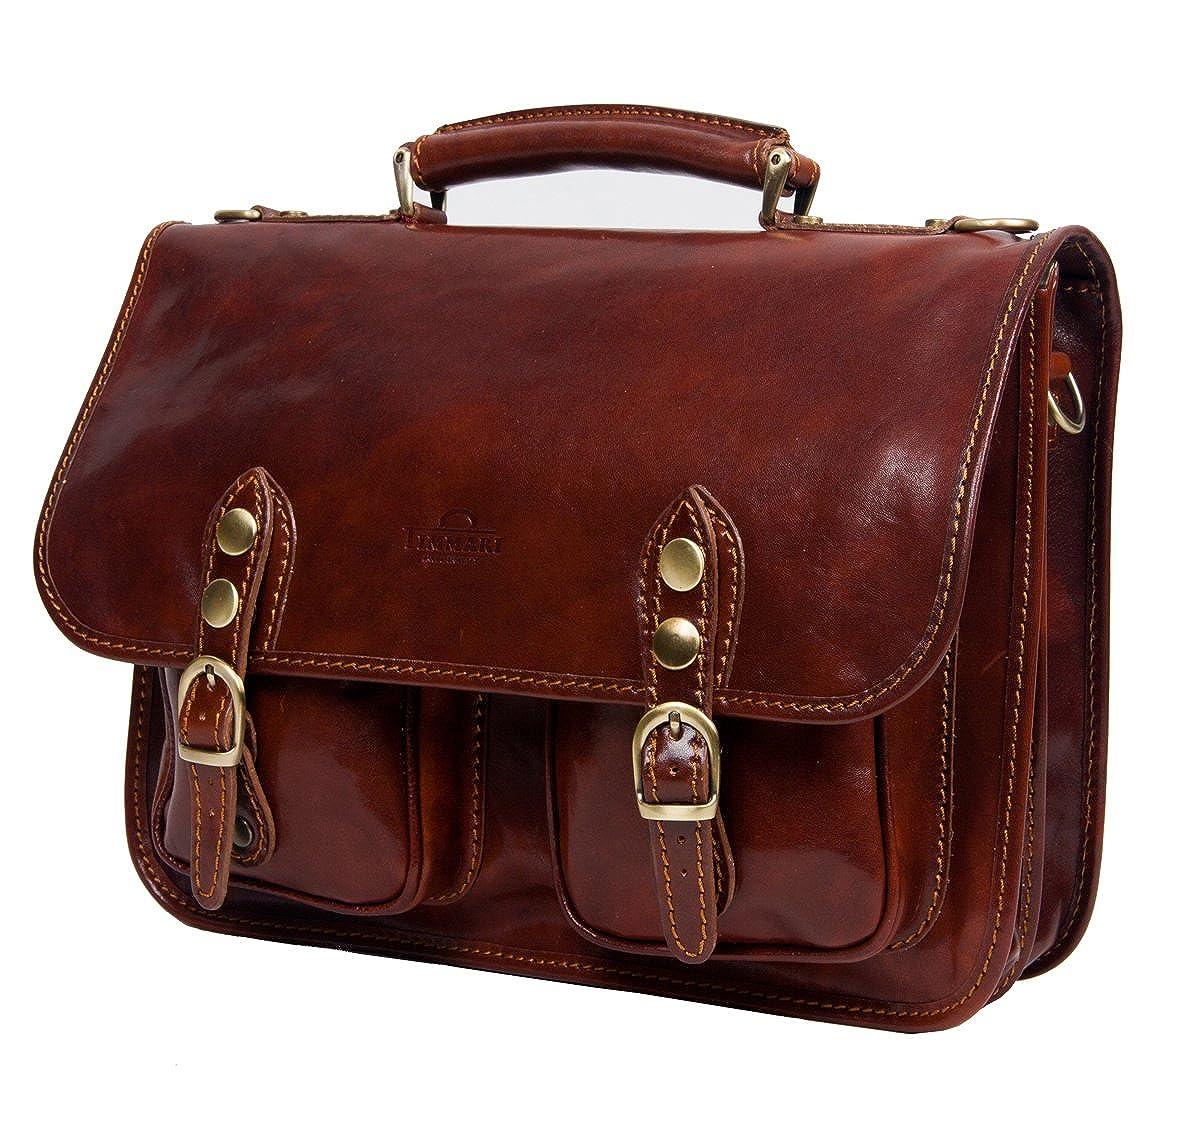 Timmari Vine Collection Italian Leather Messenger Bag